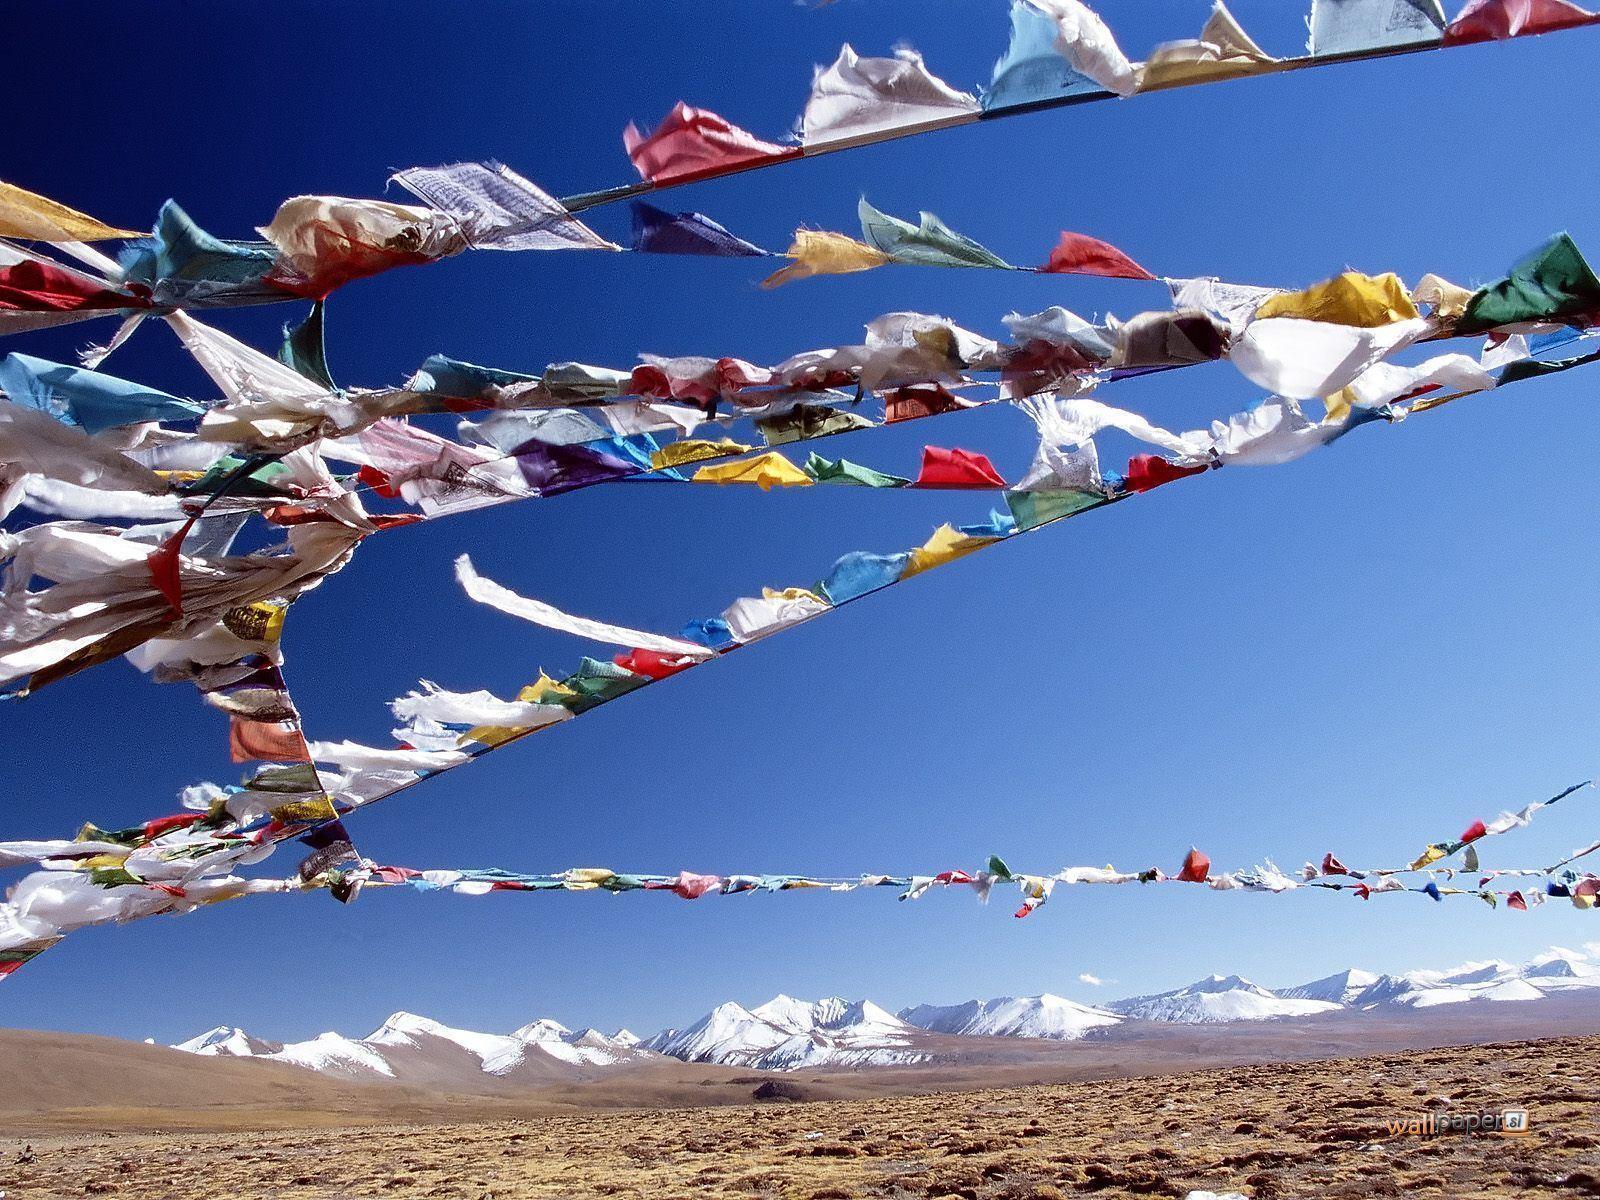 tibetan wallpapers - wallpaper cave